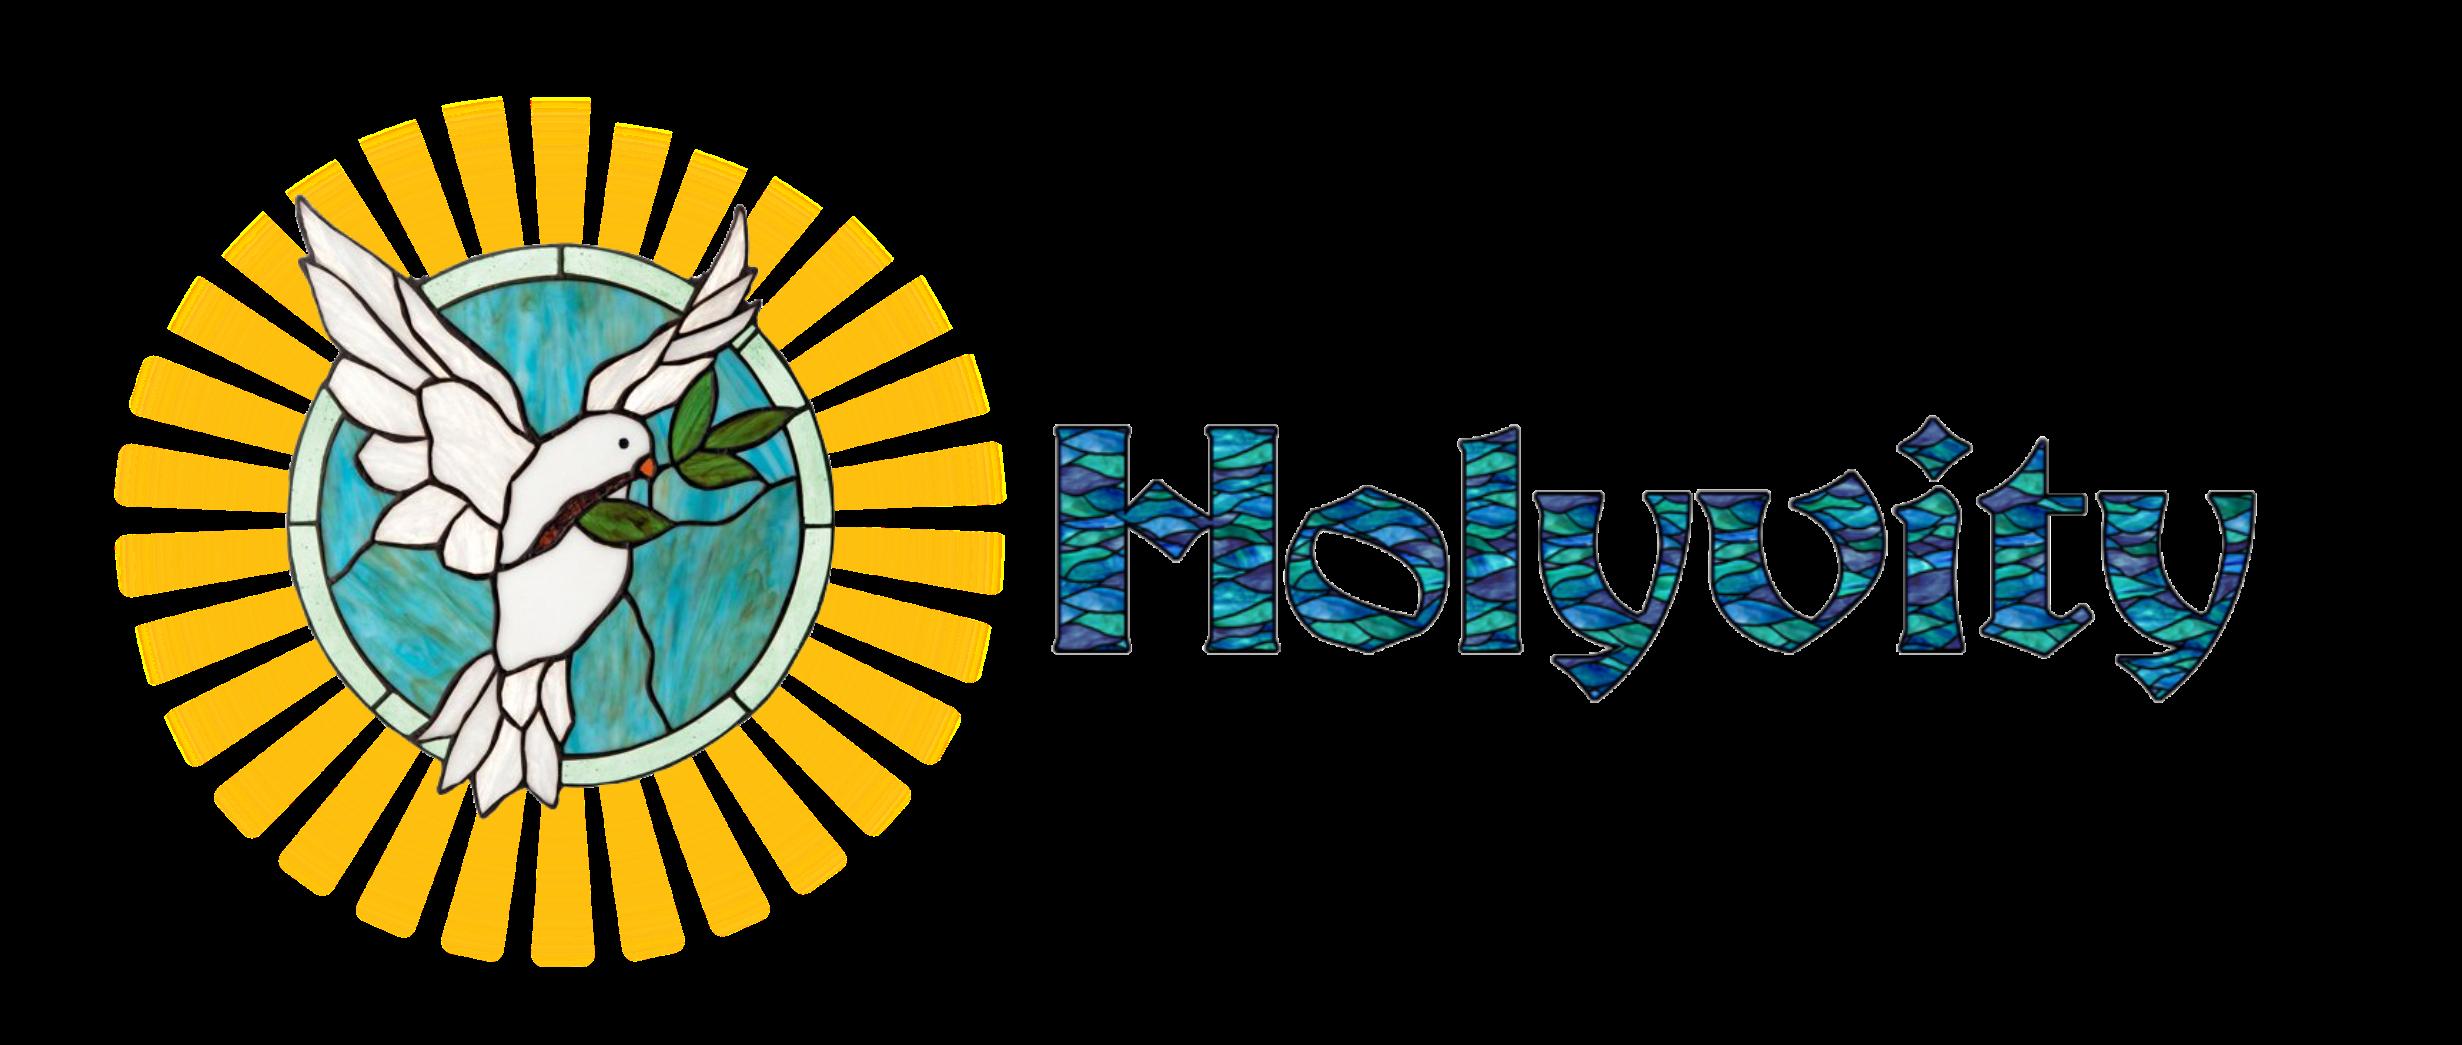 Holyvity